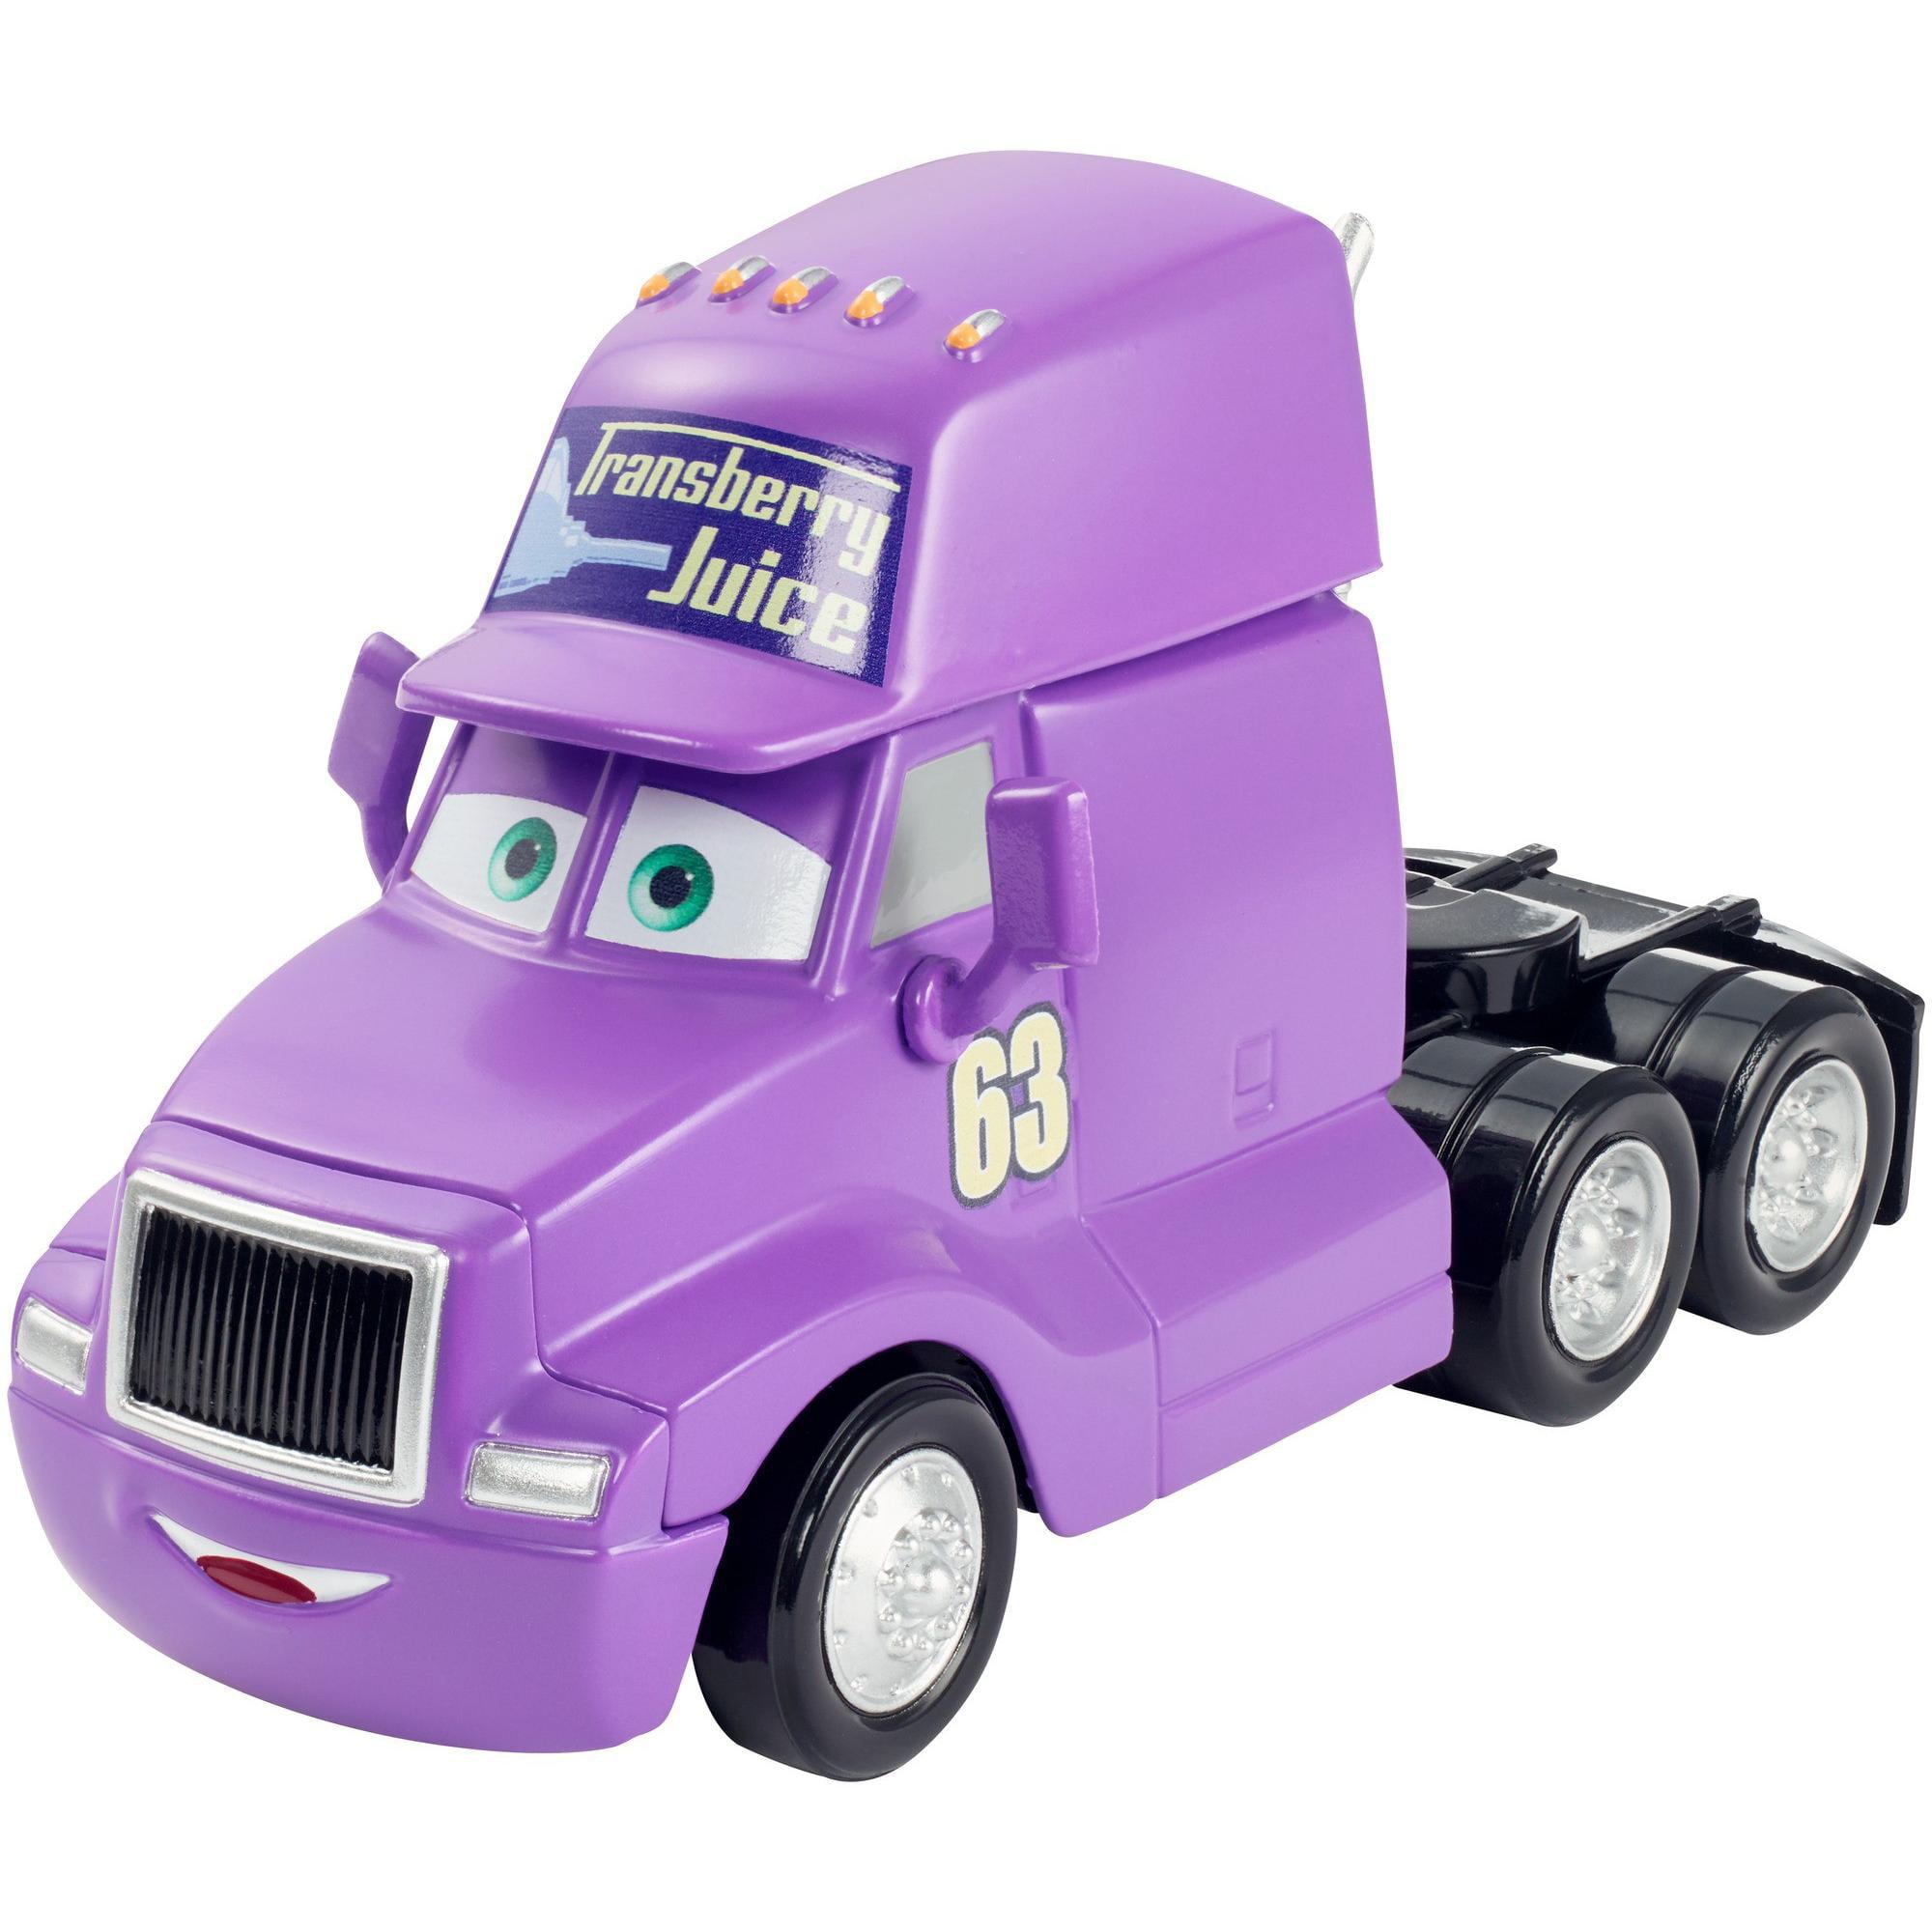 Disney Pixar Cars Cb Die Cast Character Semi Truck Vehicle